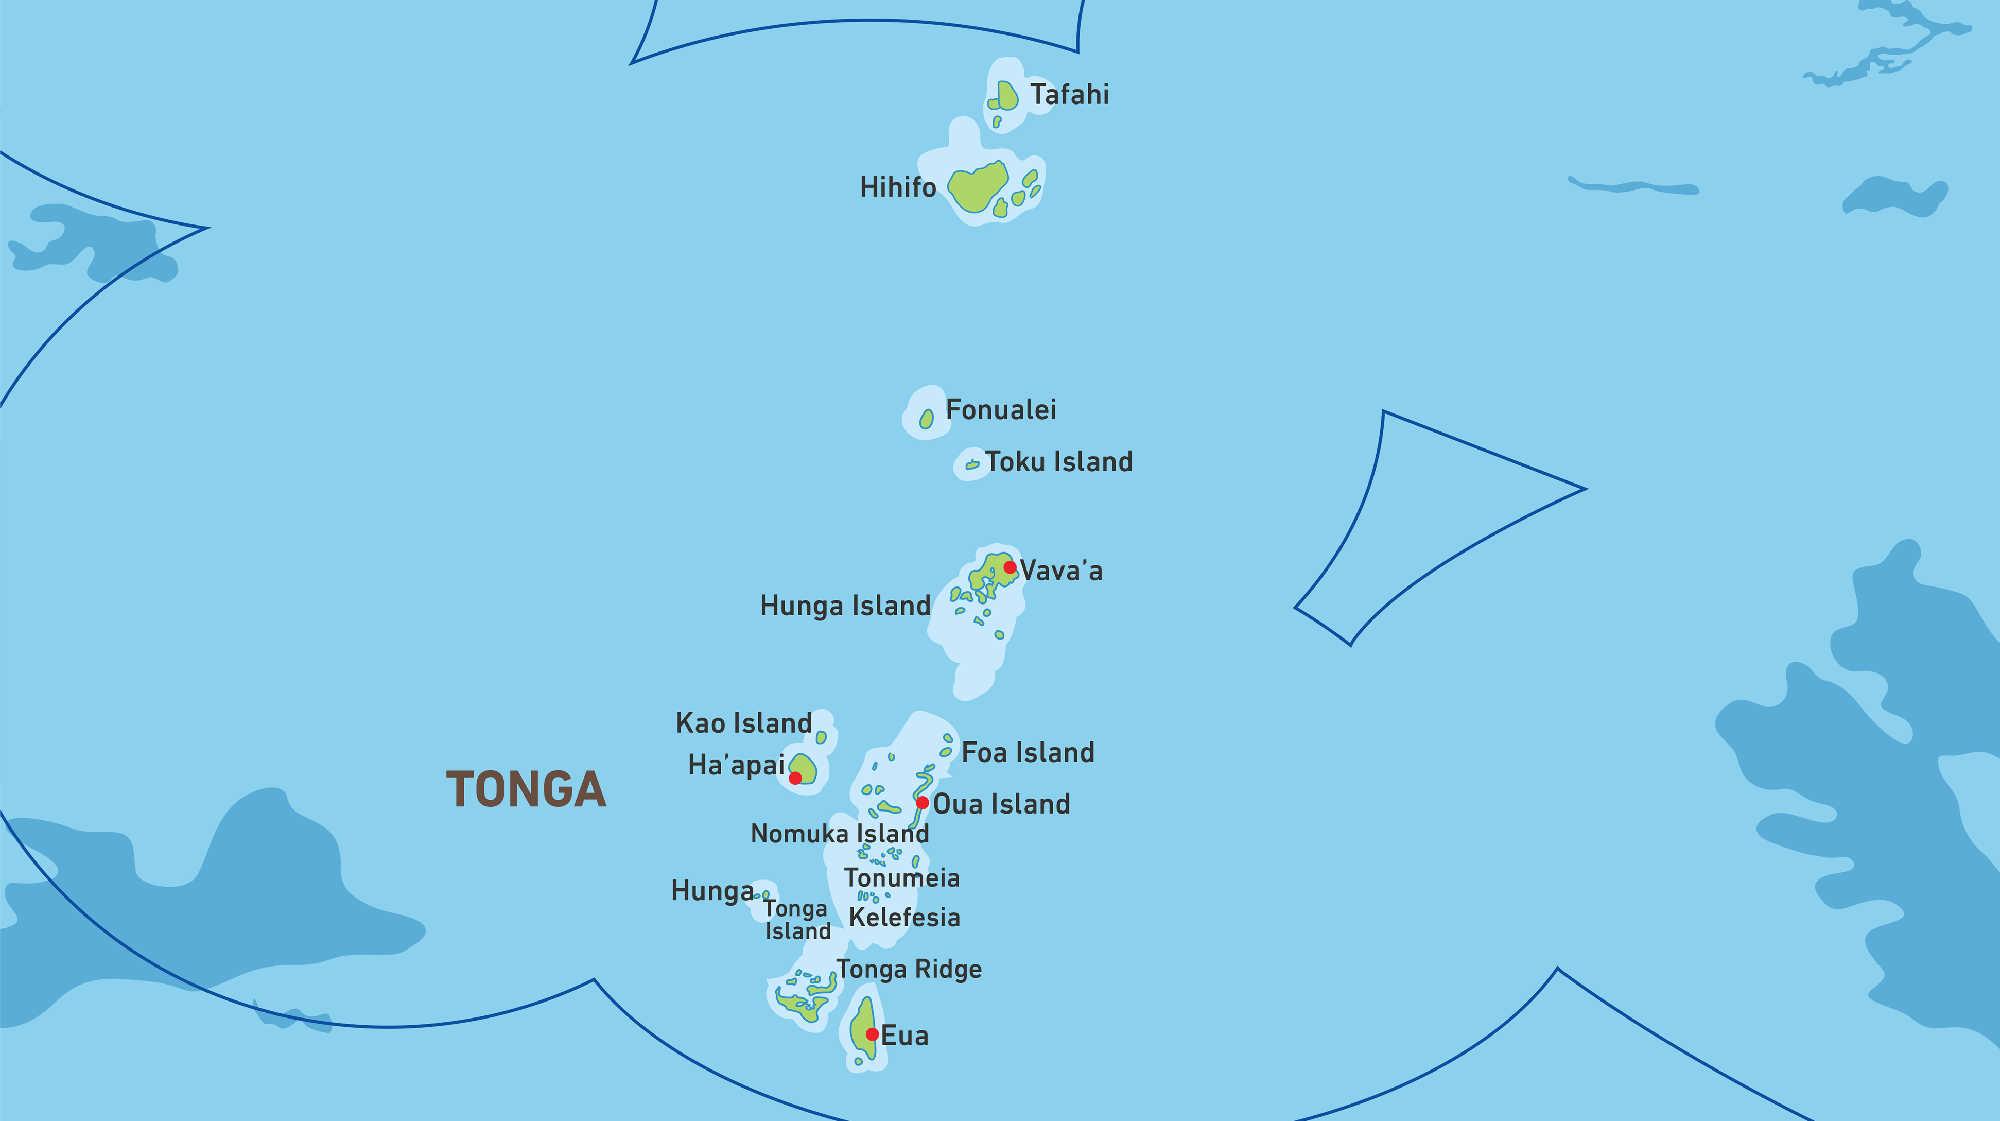 Map of Kacific 1 satellite coverage of Tonga